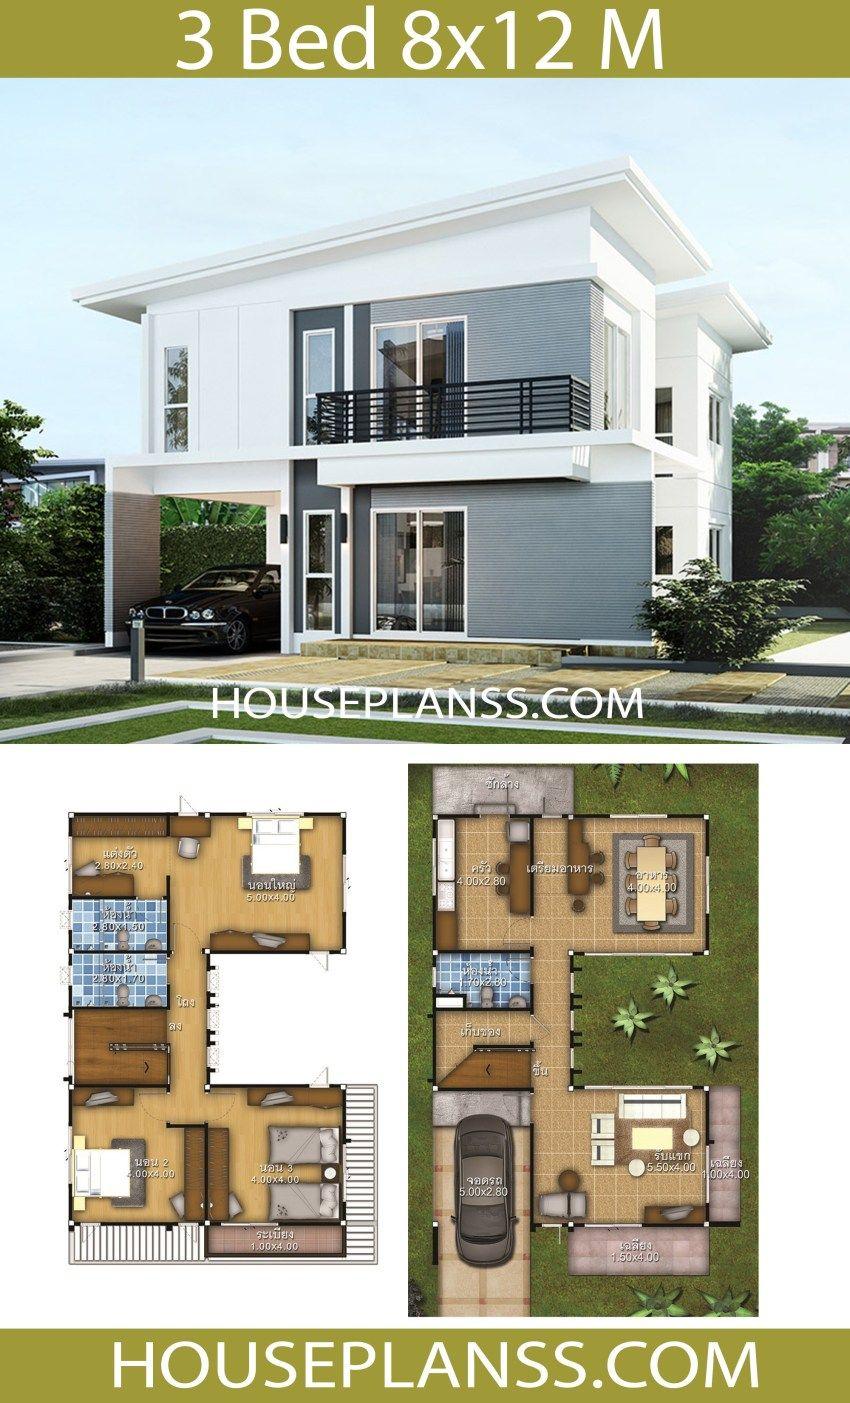 House Plans Idea 8x12 With 3 Bedrooms House Plans S Kerala House Design House Architecture Design House Design